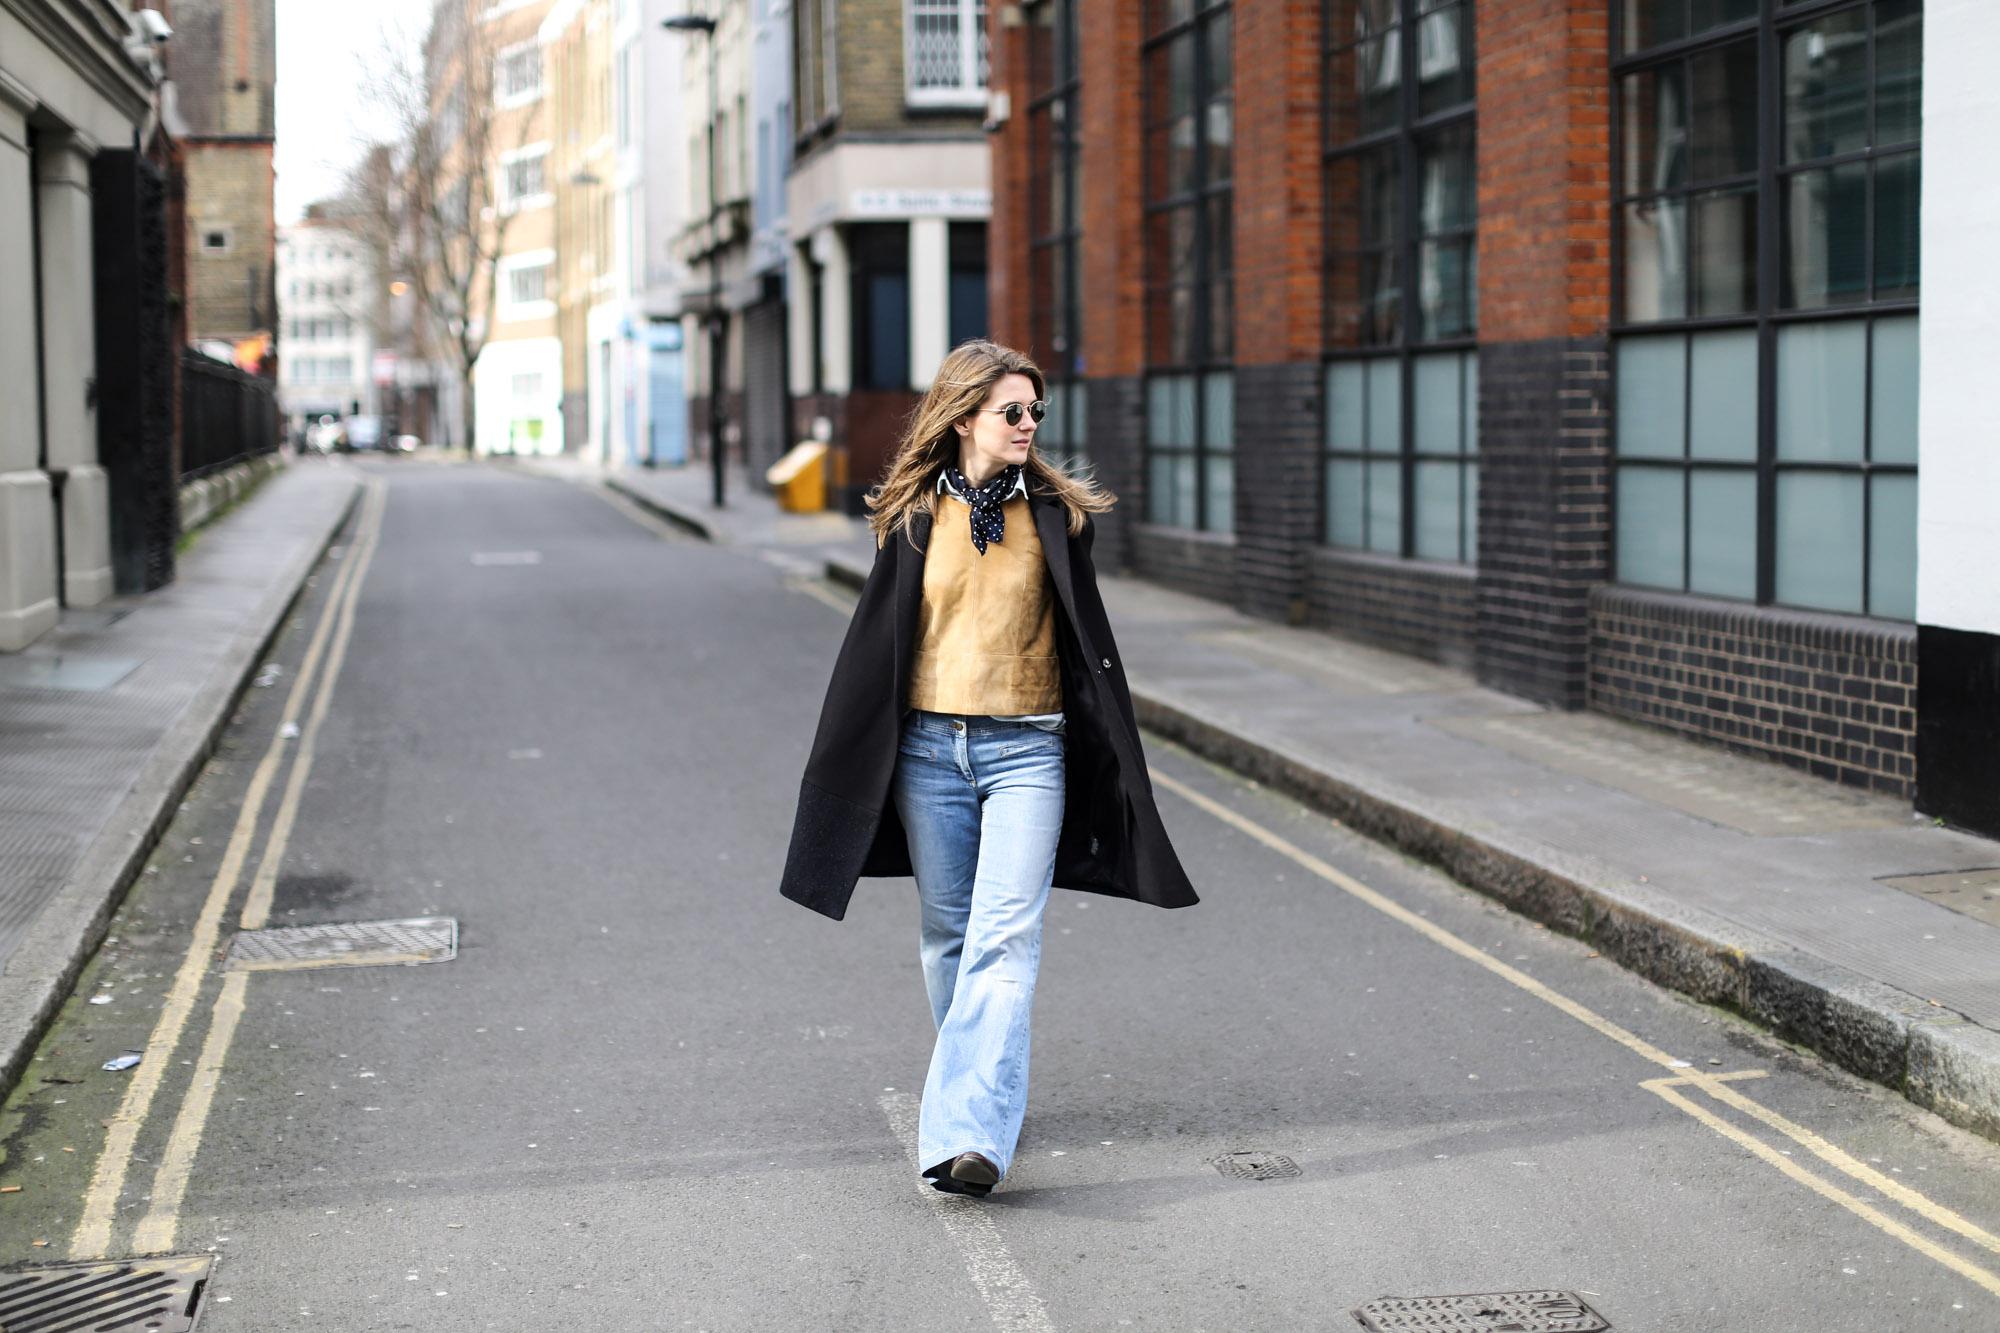 Clochet-wide-retro-jeans-suede-top-cos-coat-7